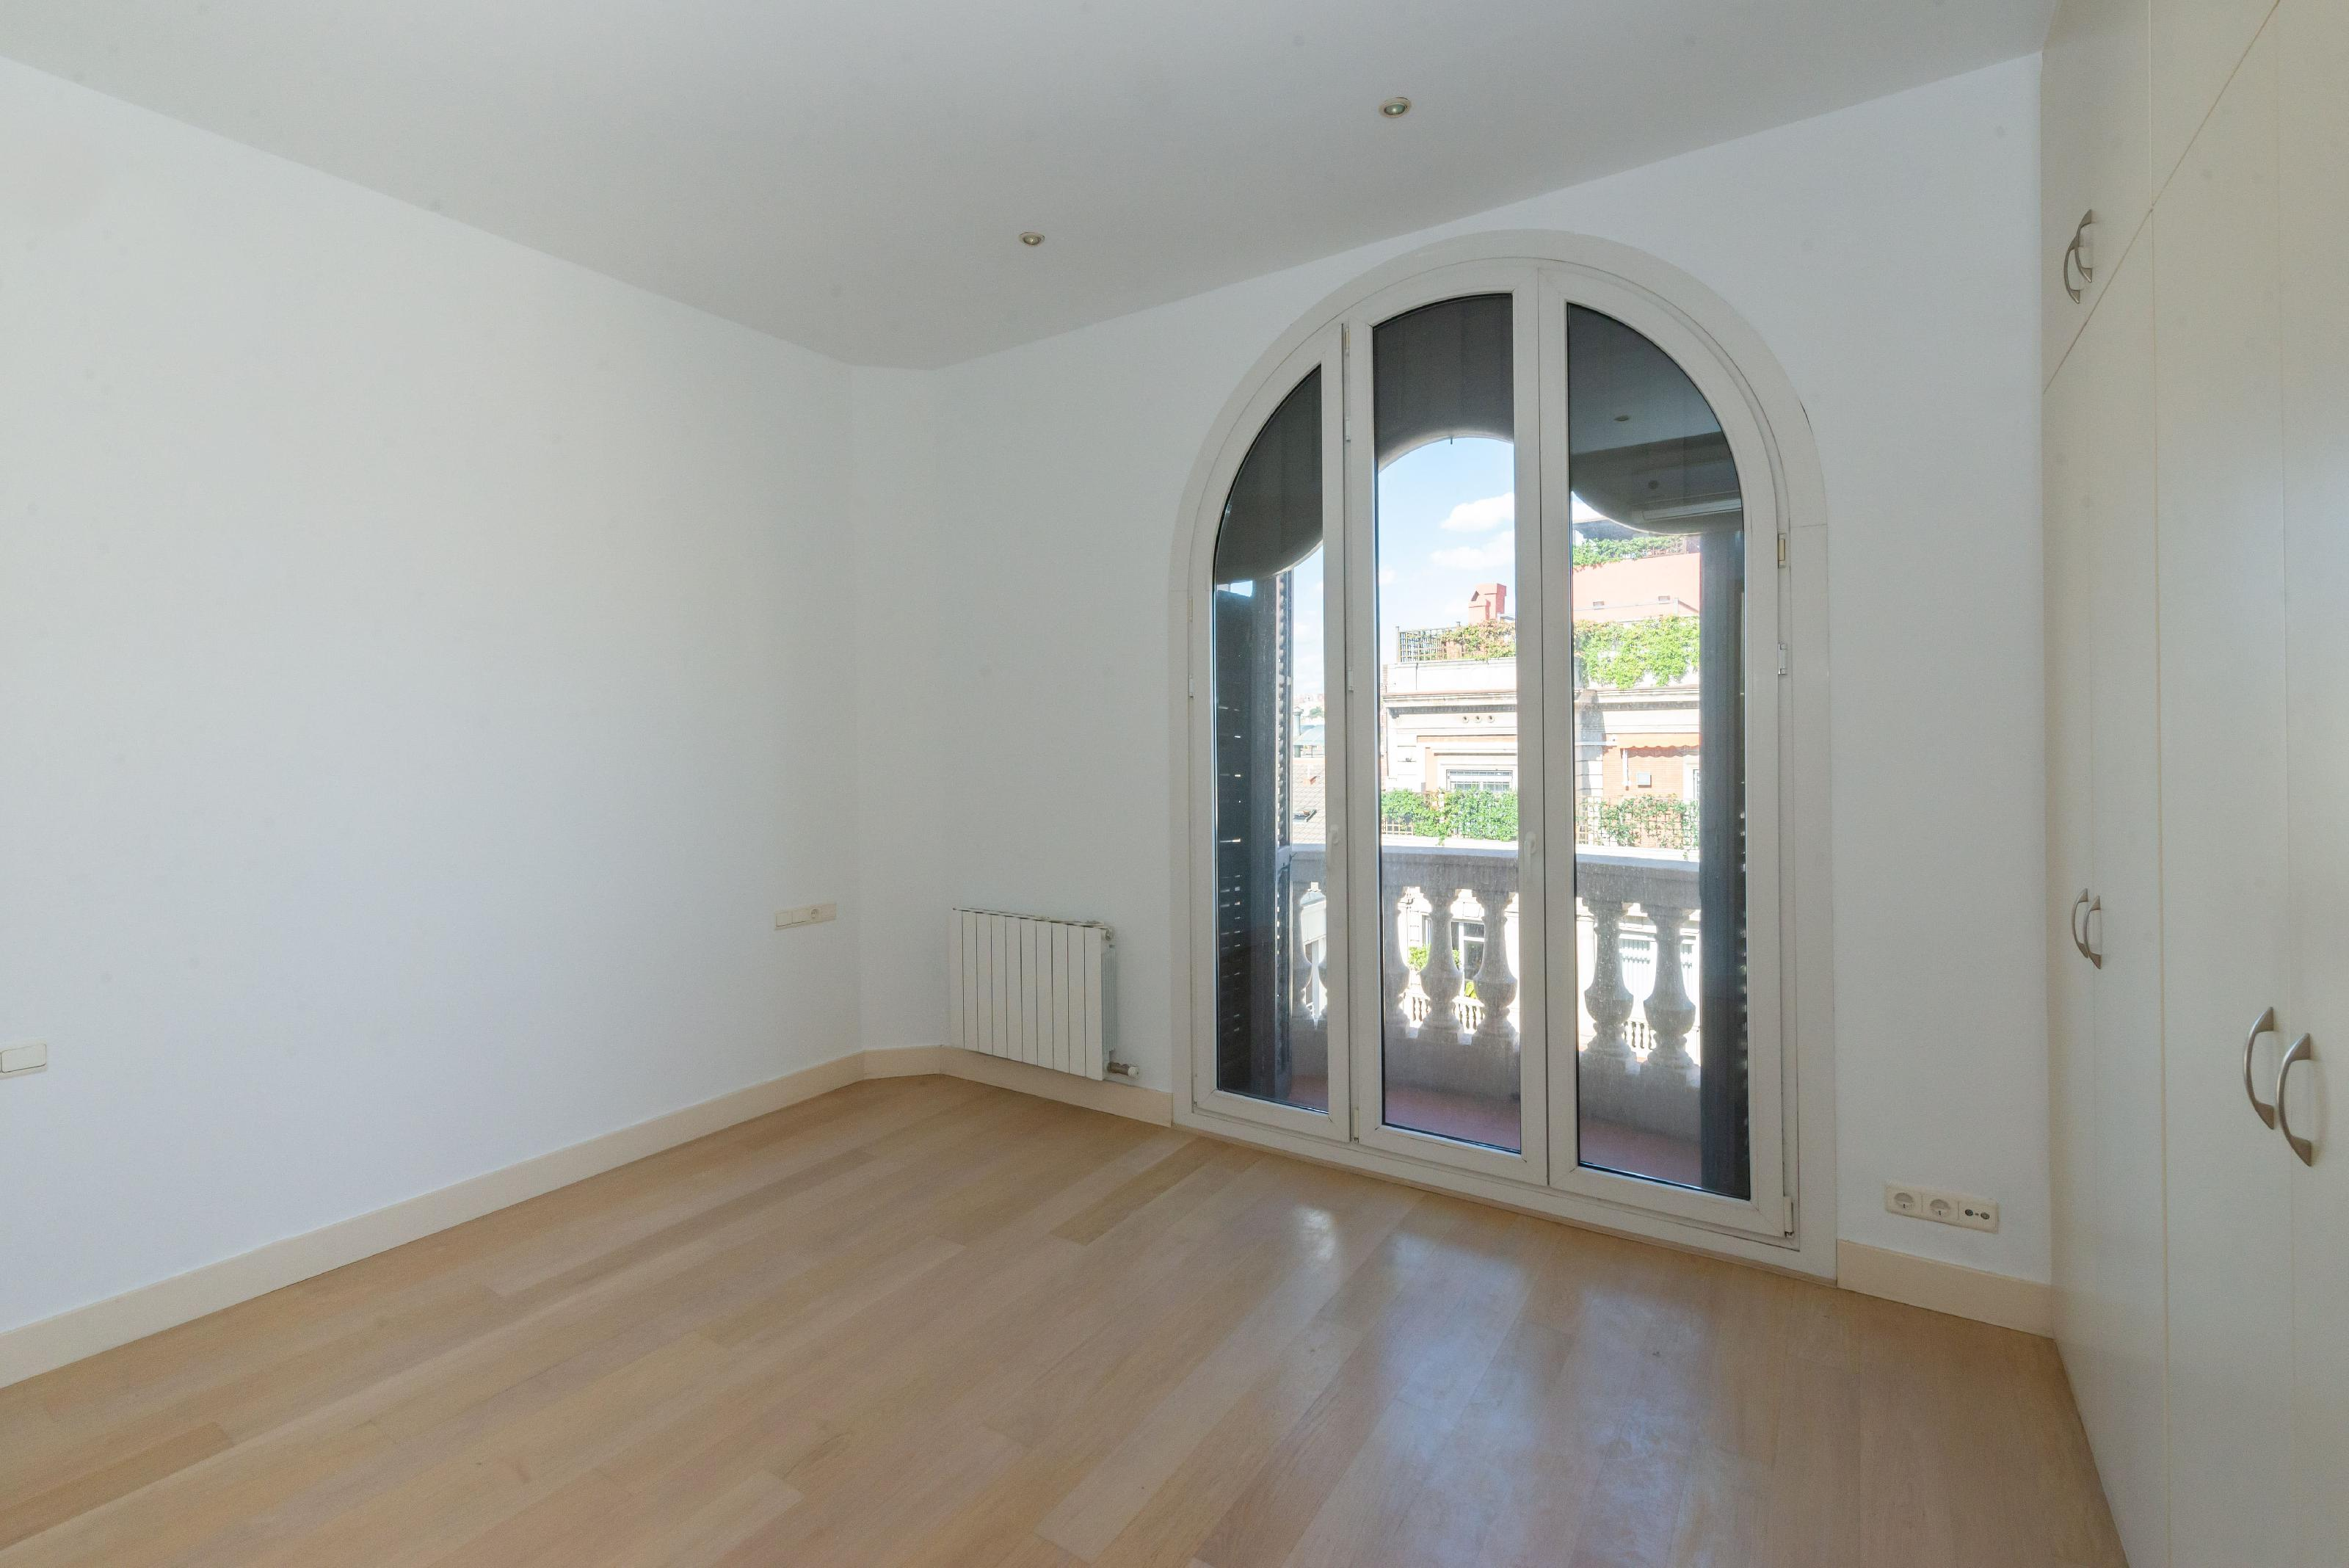 253647 Ático en venda en Sarrià-Sant Gervasi, Sant Gervasi-Galvany 36